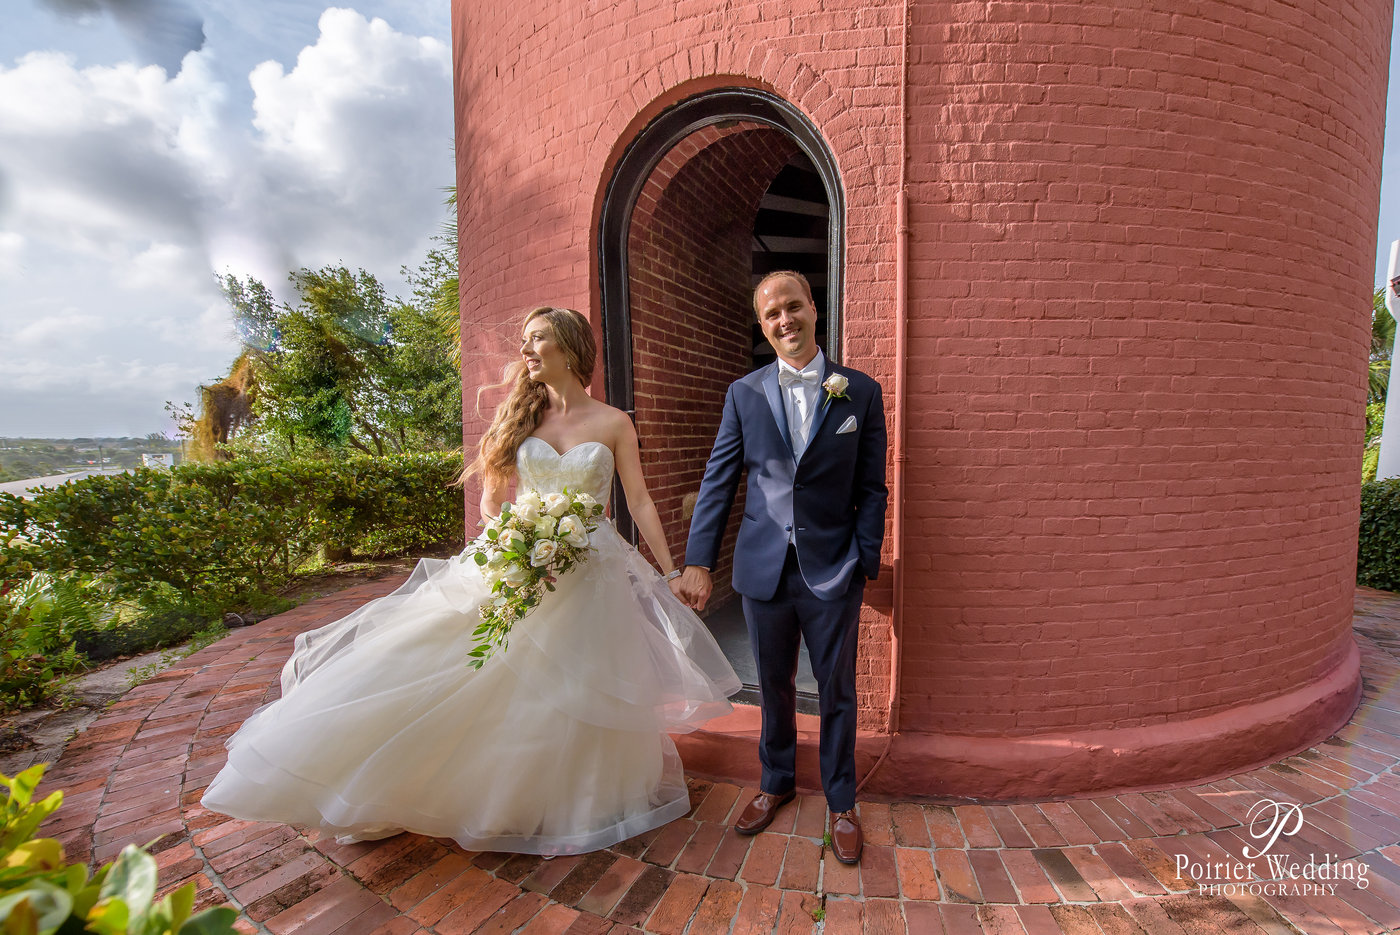 View More: http://poirierweddingphotography.pass.us/jupiter-lighthouse